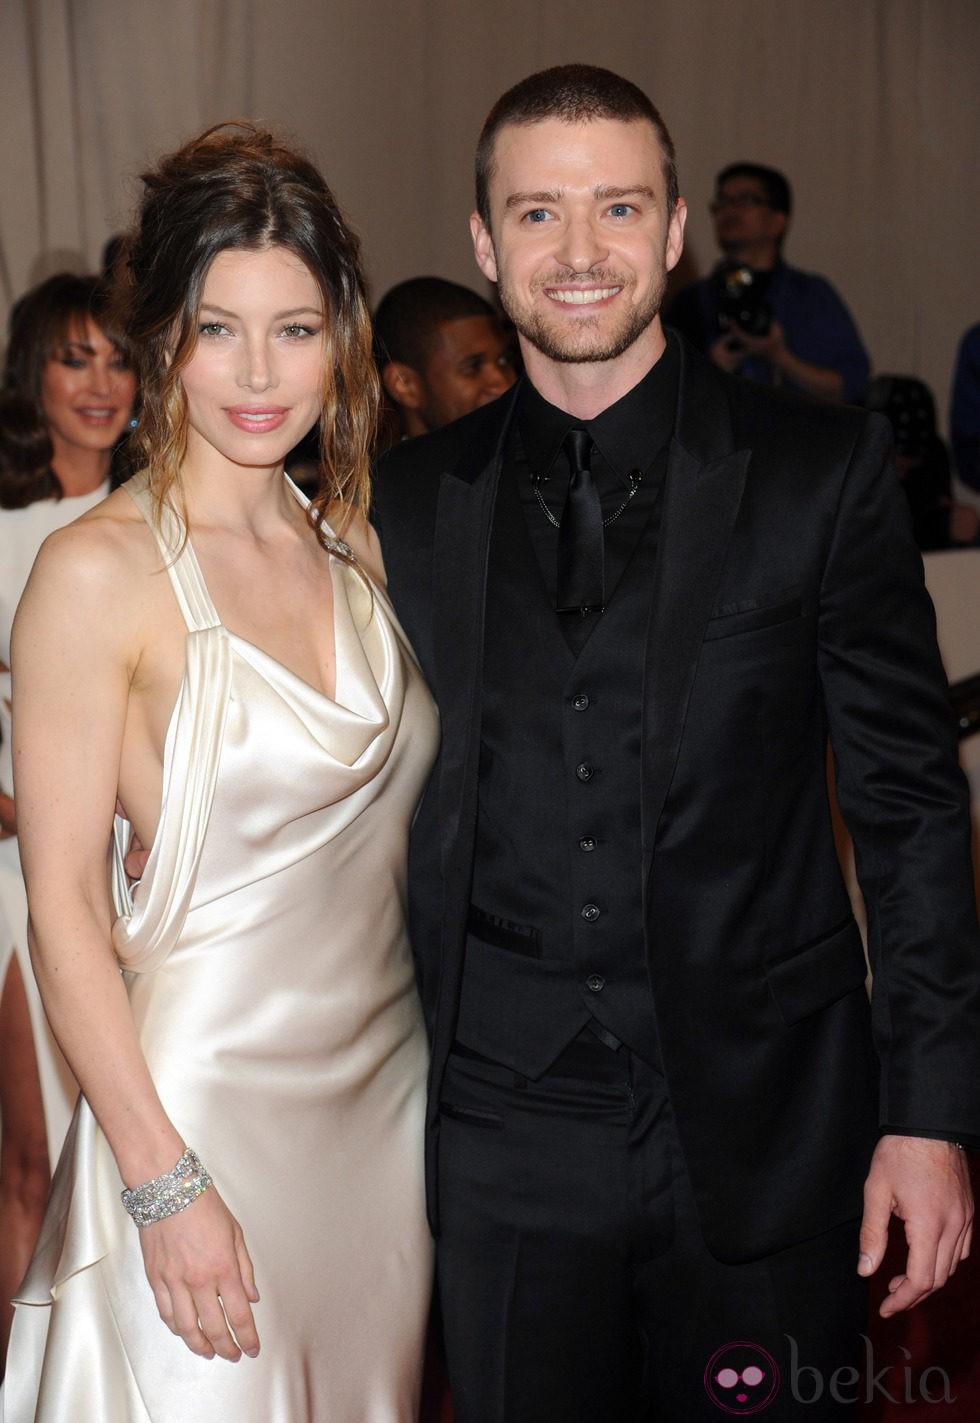 Justin Timberlake y Jessica Biel, una pareja muy atractiva